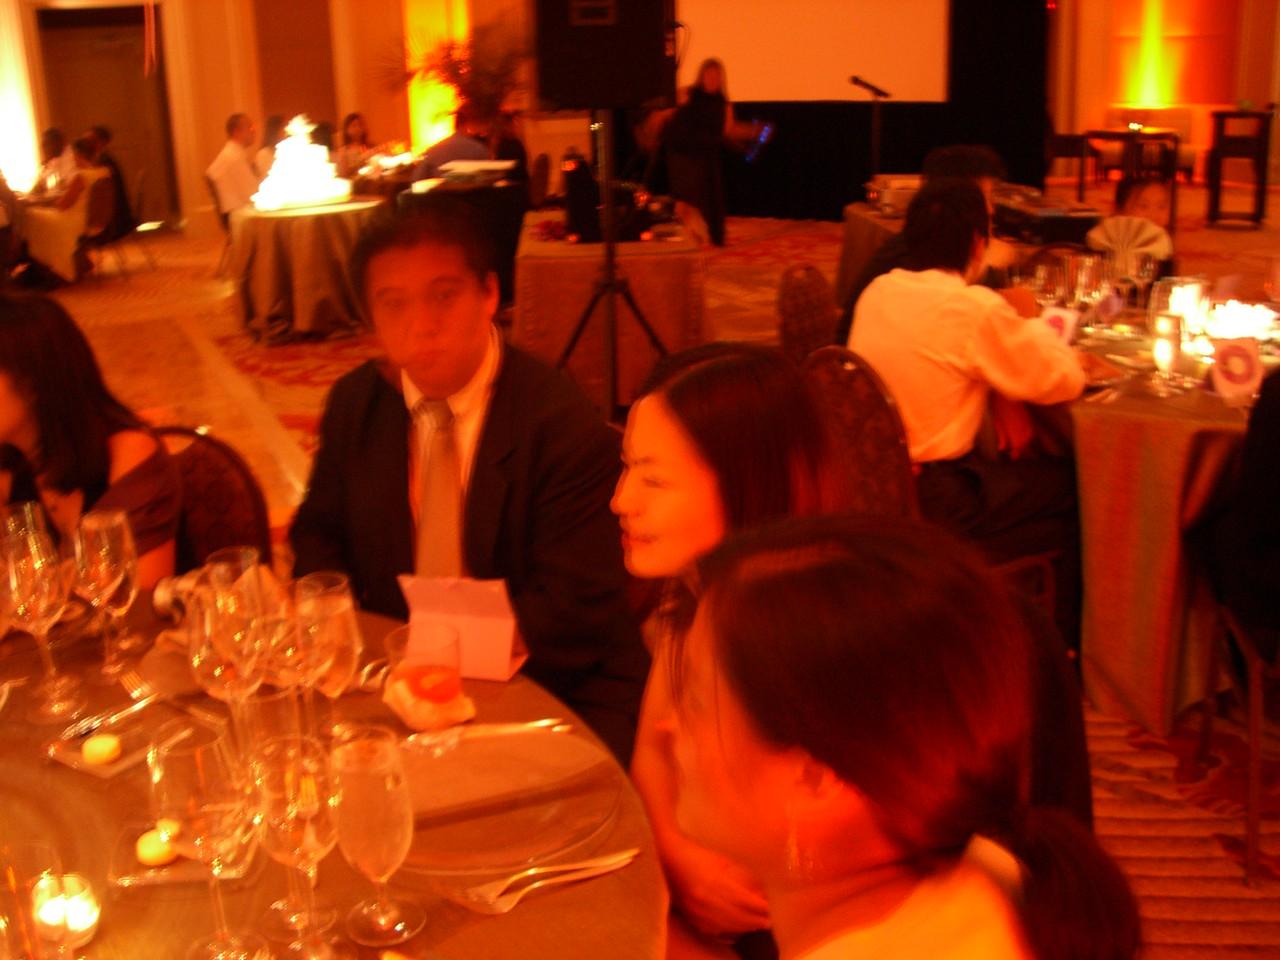 Reception - Lawrence Joe, Kelly Chang, & Eve Tam 2